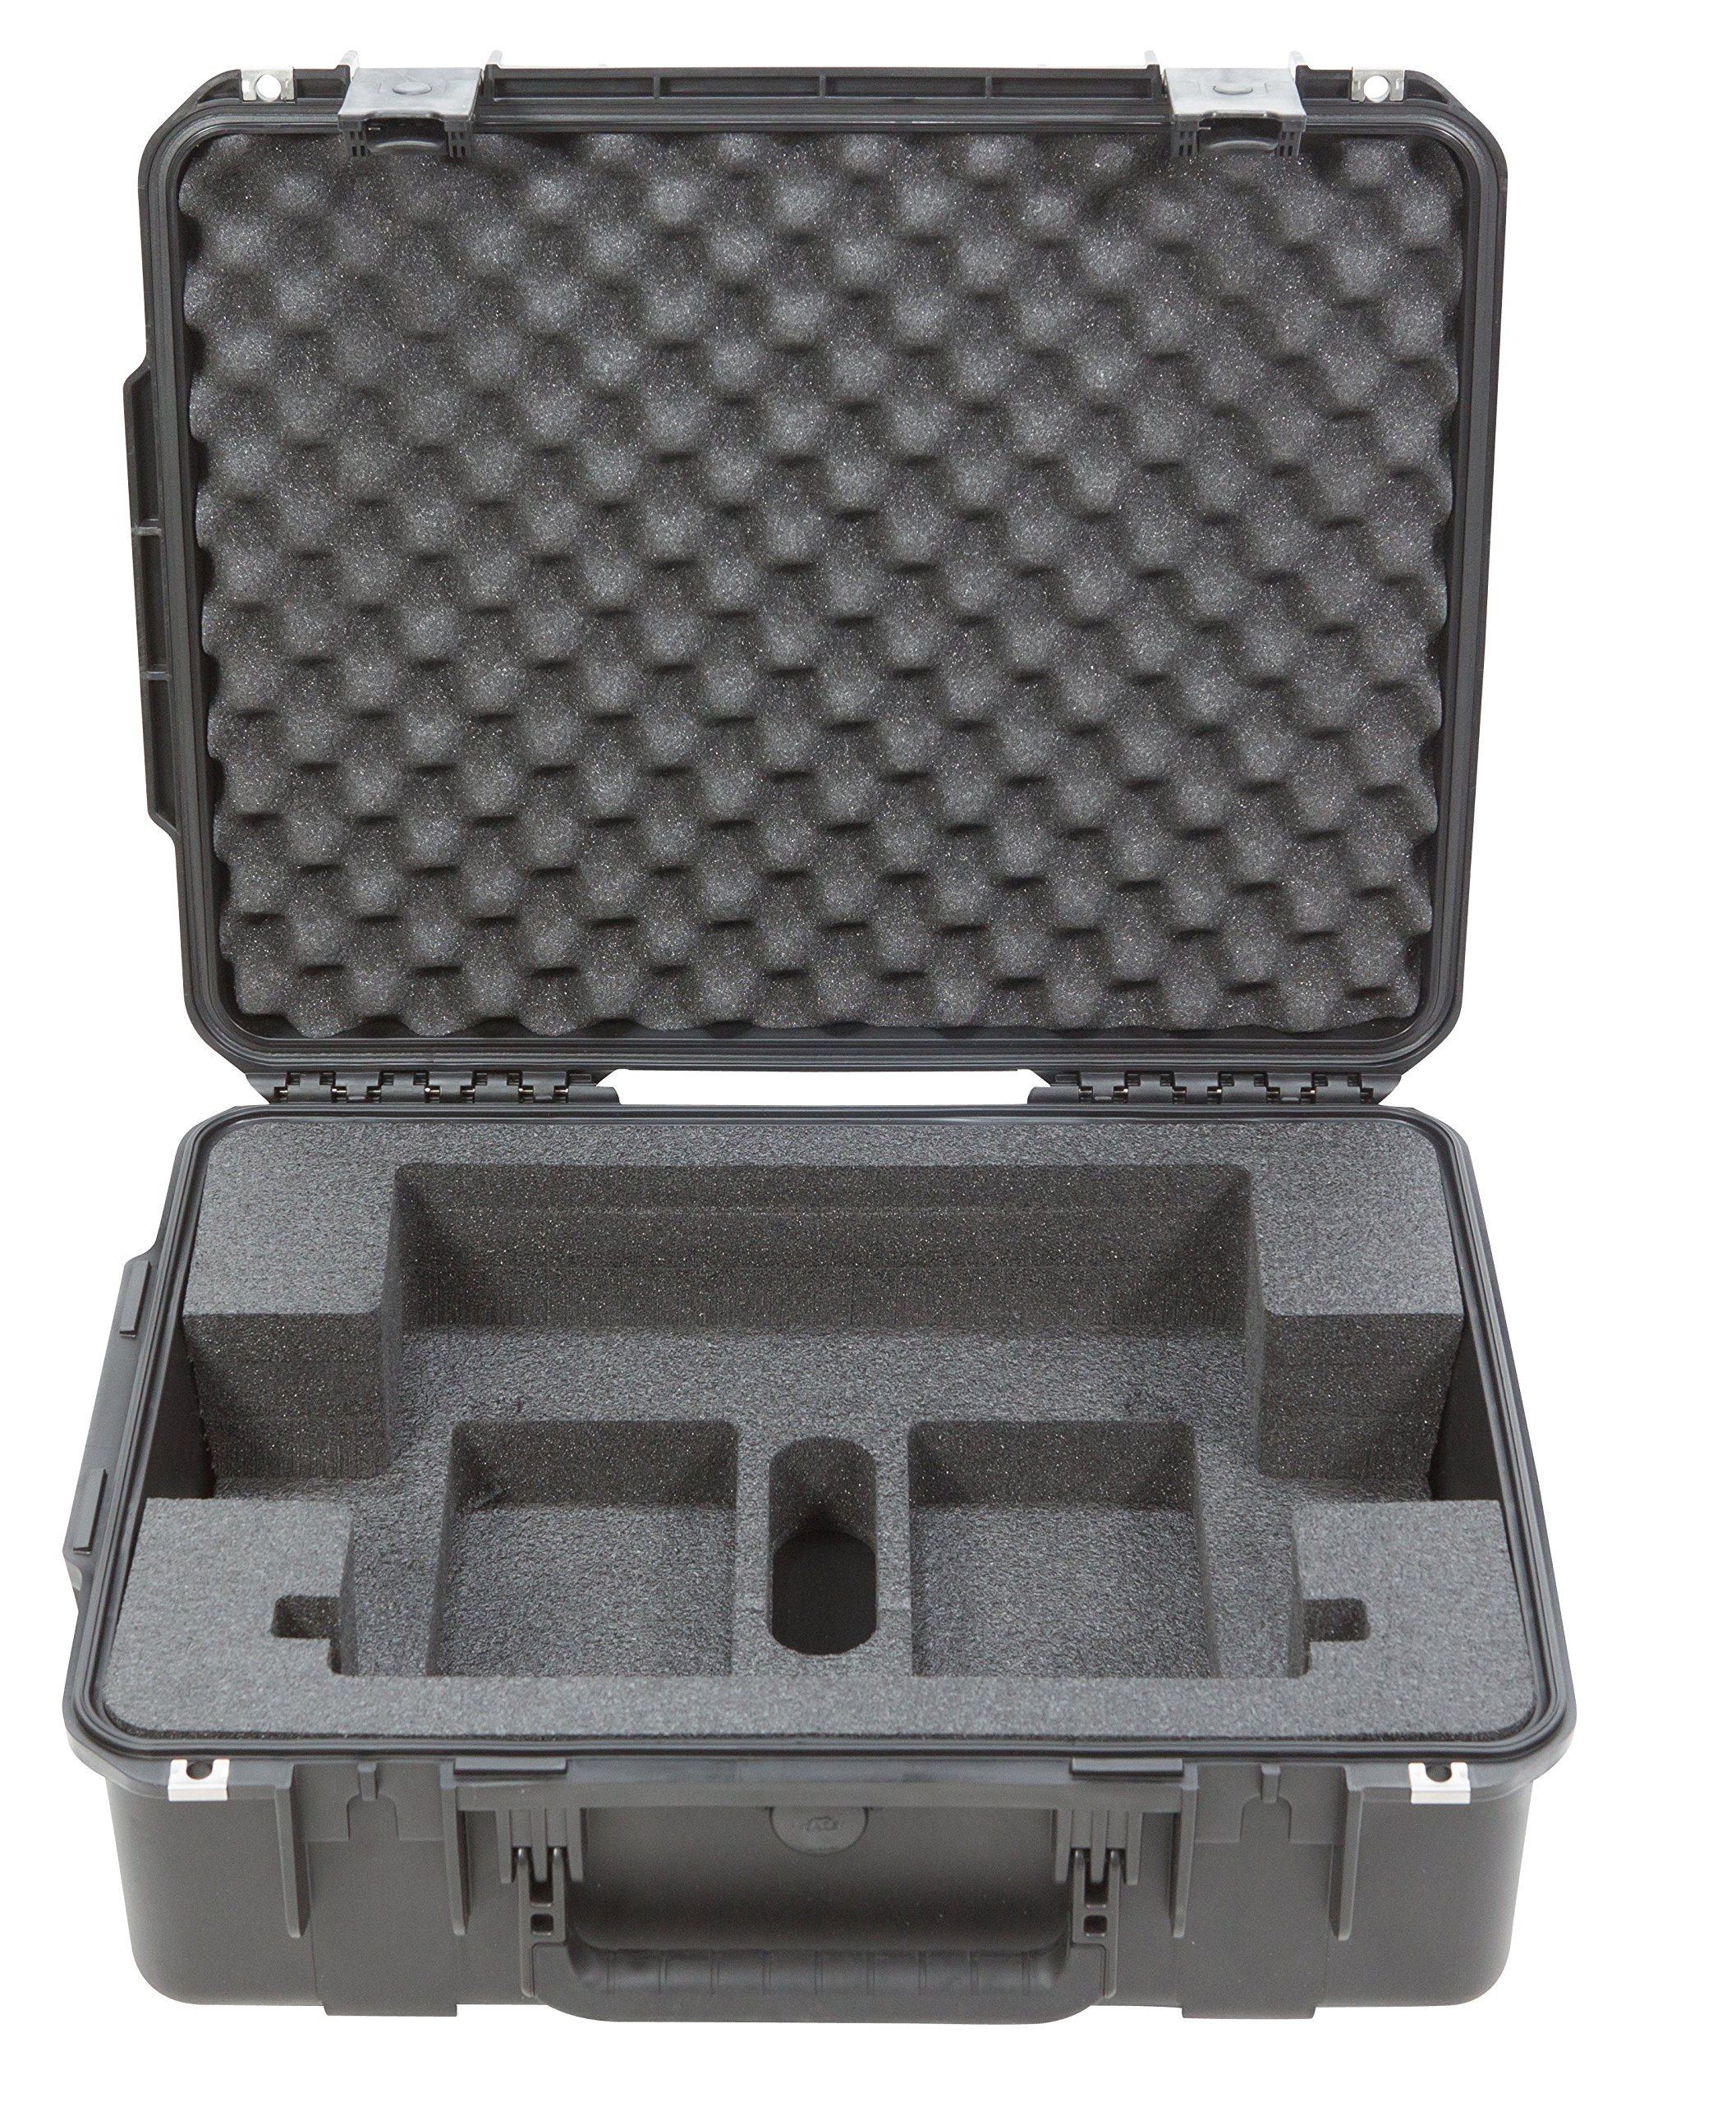 iSeries 3i-2015-7DMP Roland SPD-SX Case by SKB